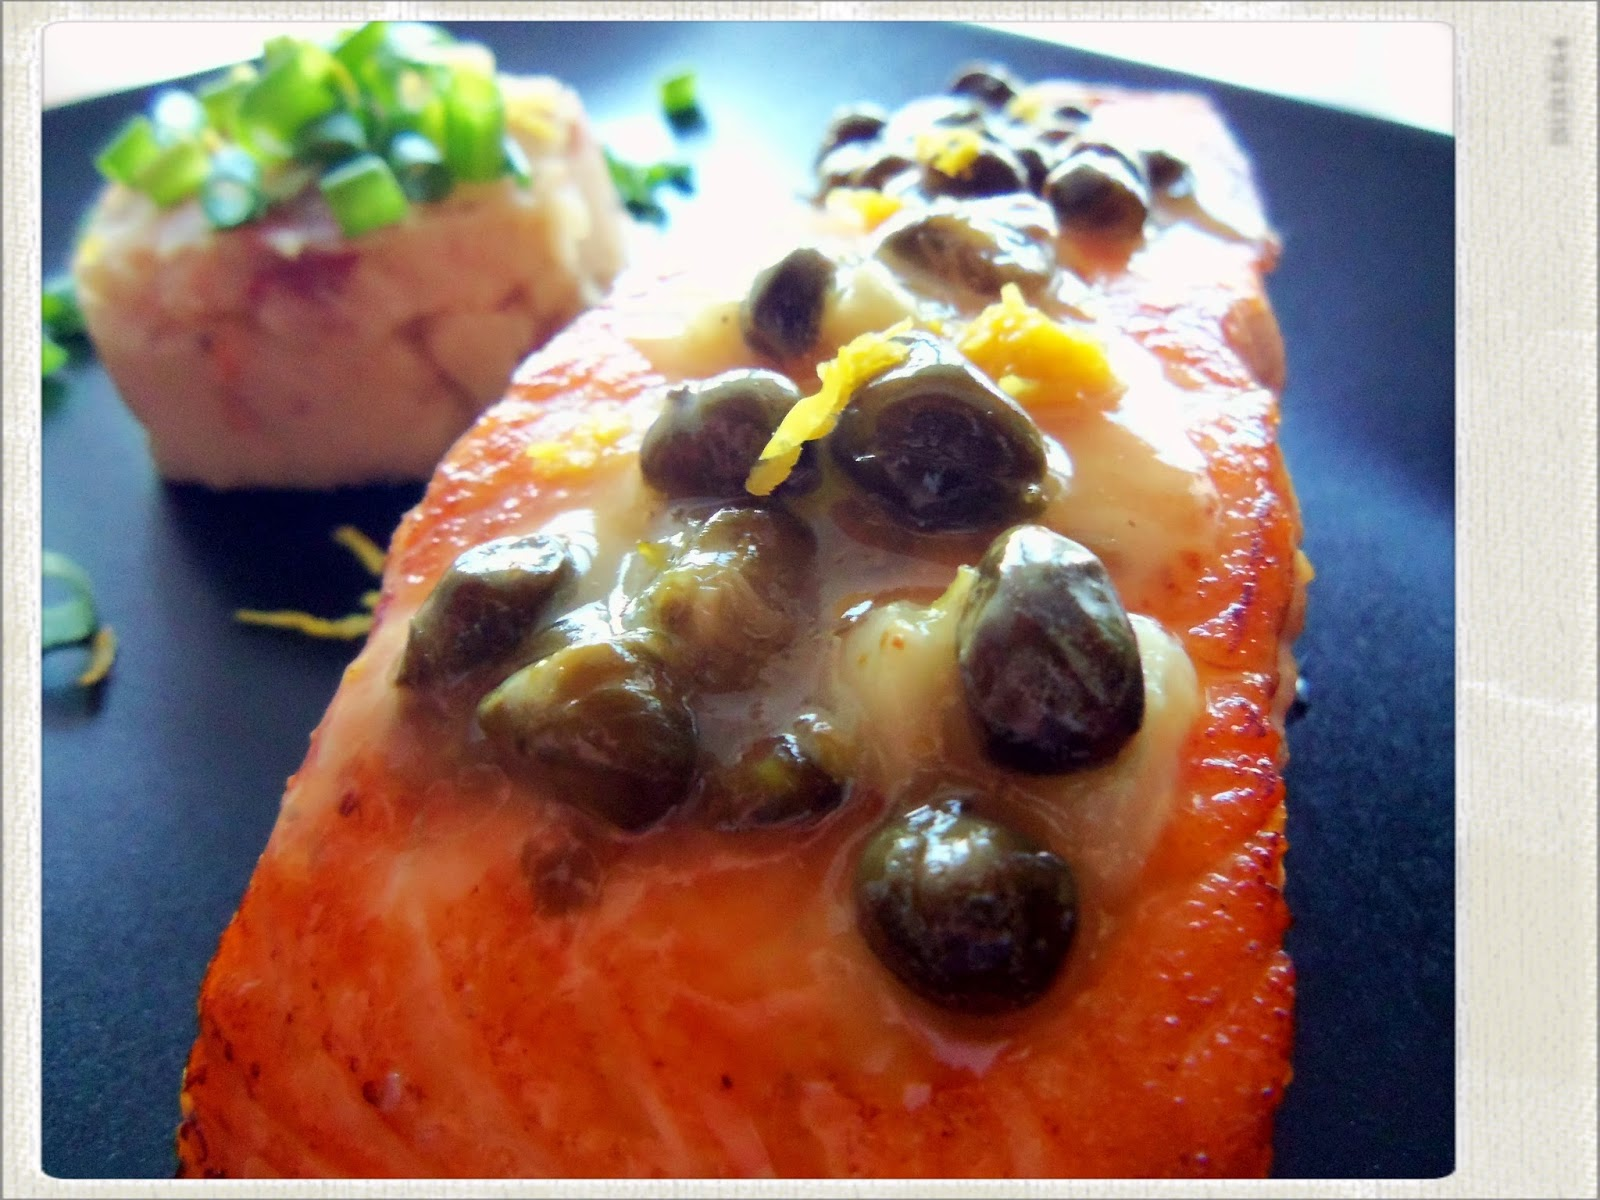 ... Salmon, Potato and Sun Dried Tomato Puree and a Lemon and Caper Sauce